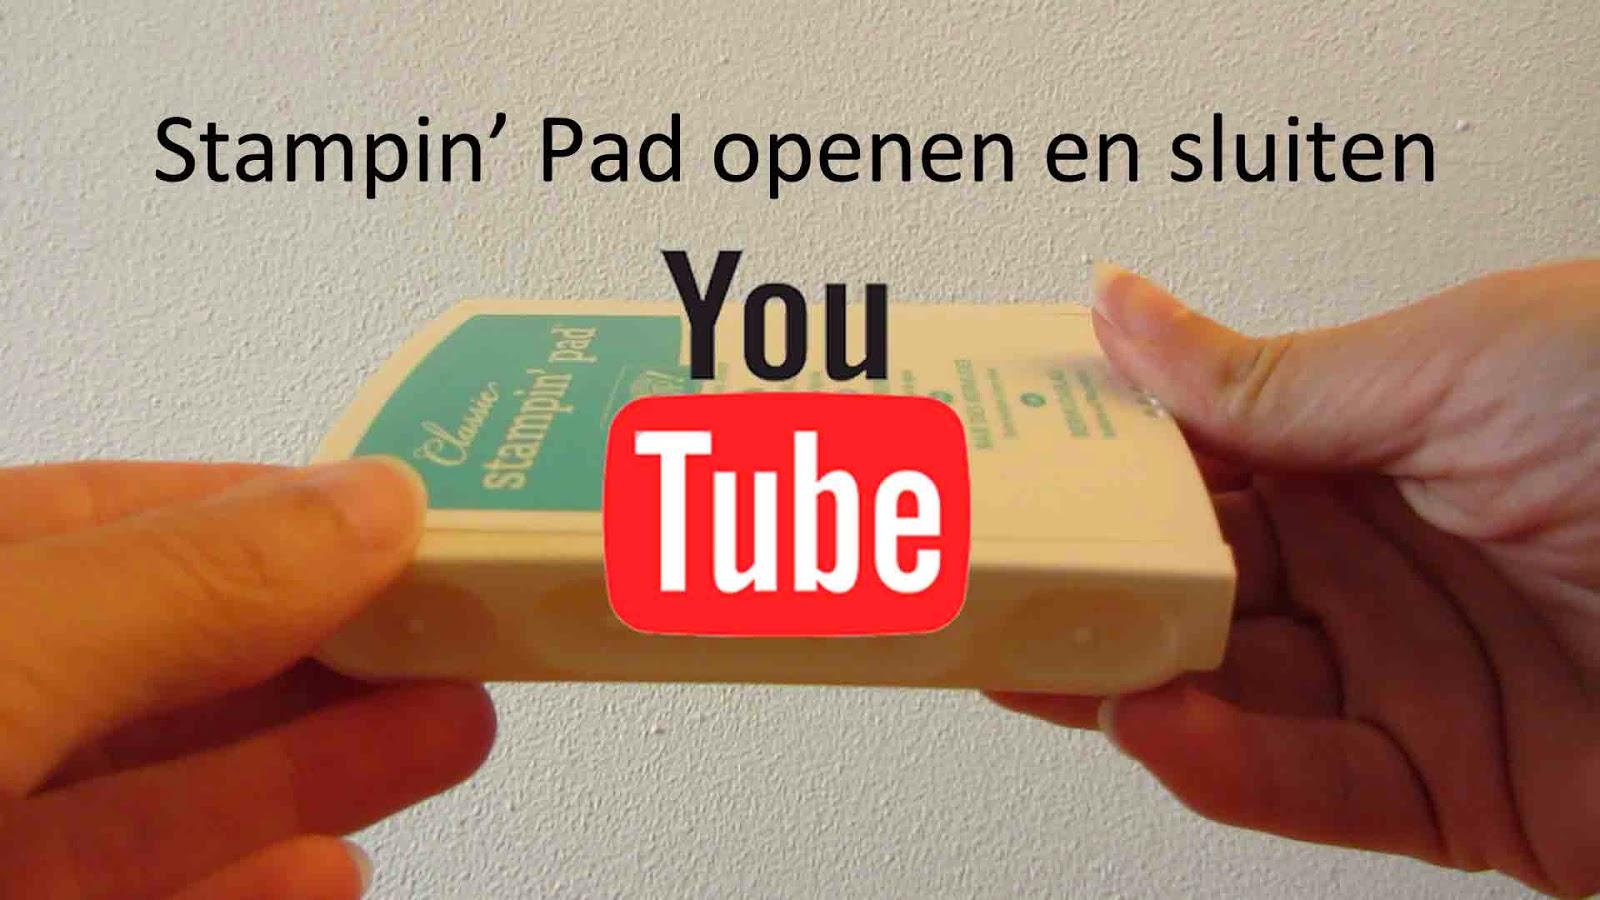 http://youtu.be/KmzHxqBlVKw